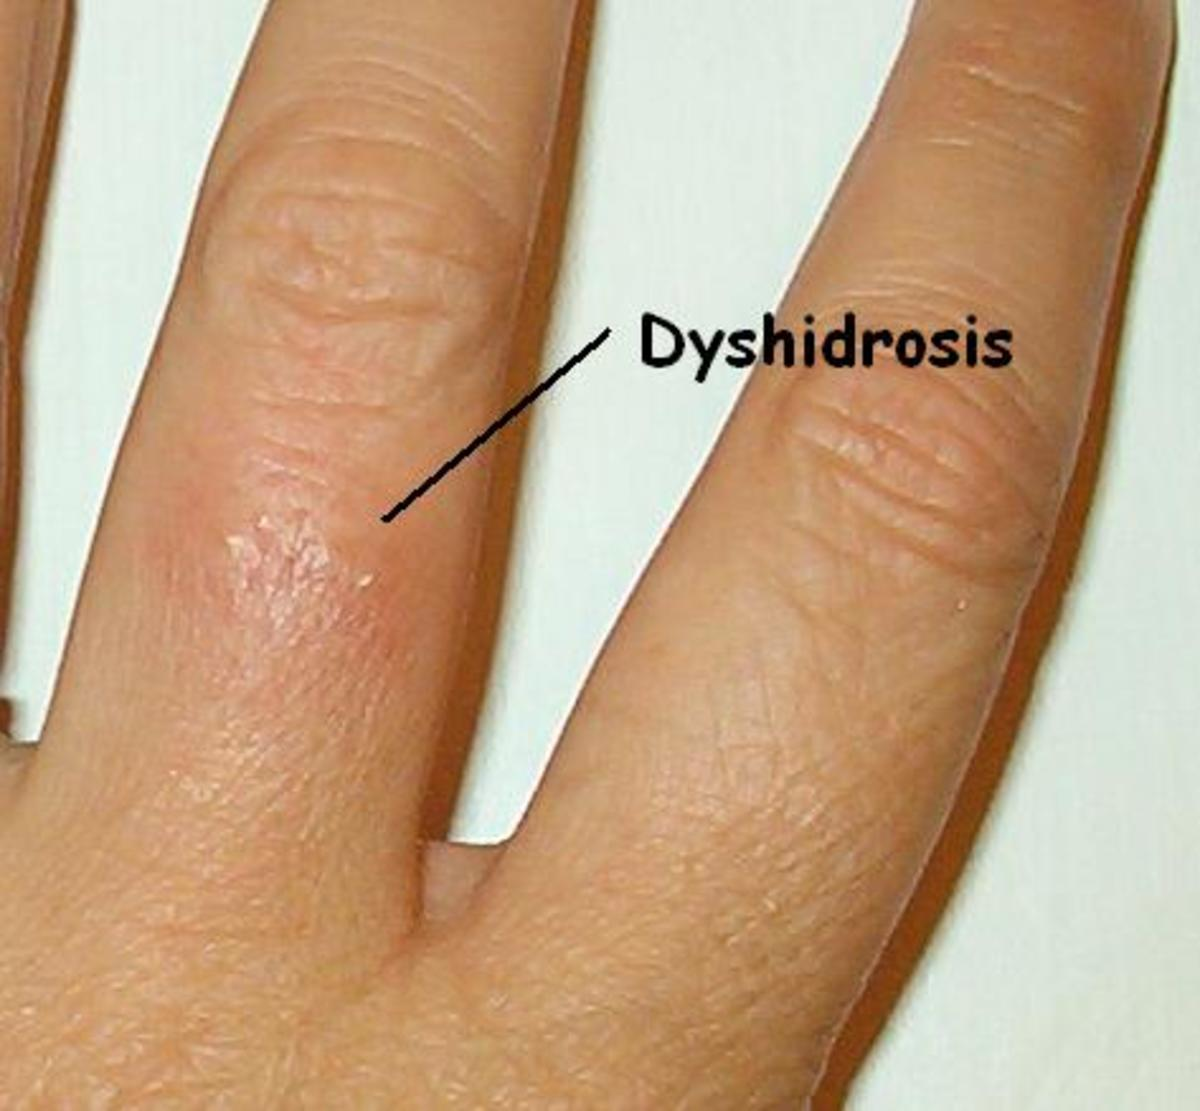 dyshidrosis | hubpages